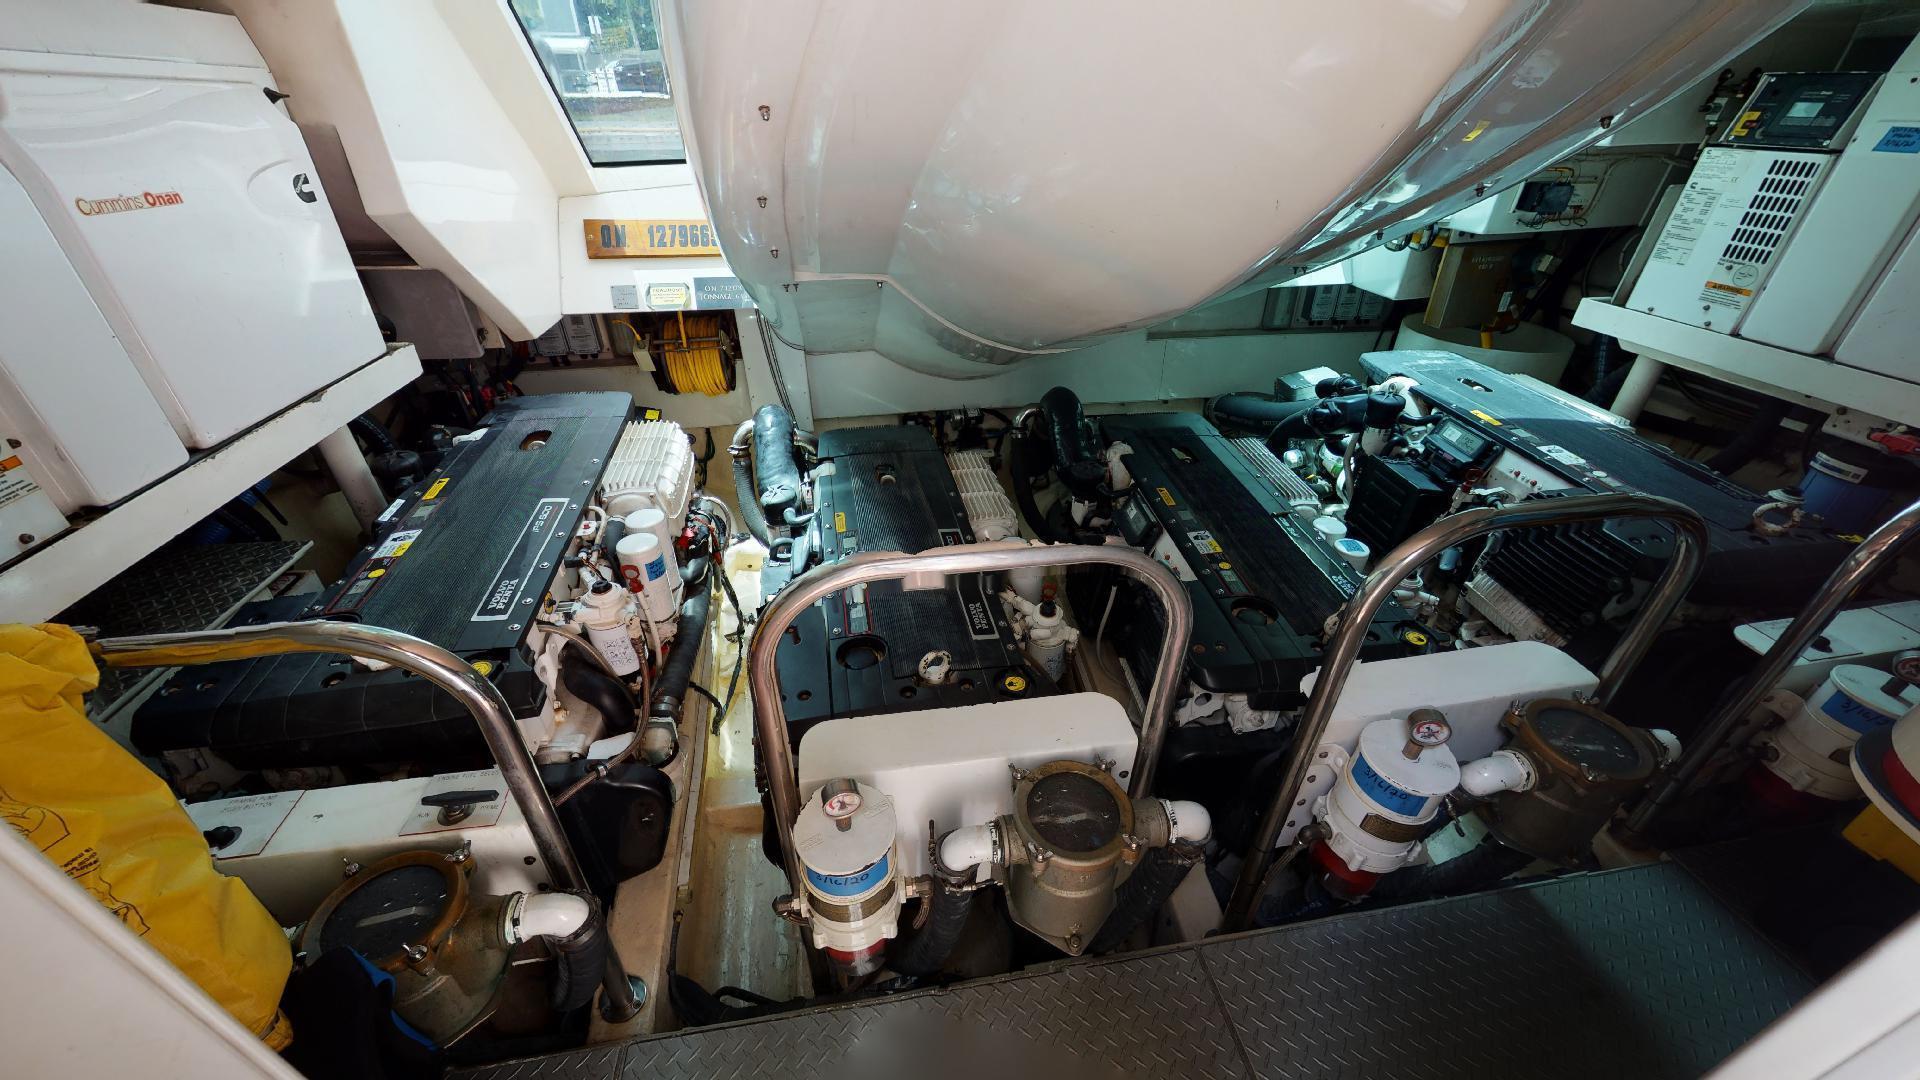 Lazzara-LSX 75 2009-MOJO Fort Lauderdale-Florida-United States-75 Lazzara Engine Room-1462679 | Thumbnail